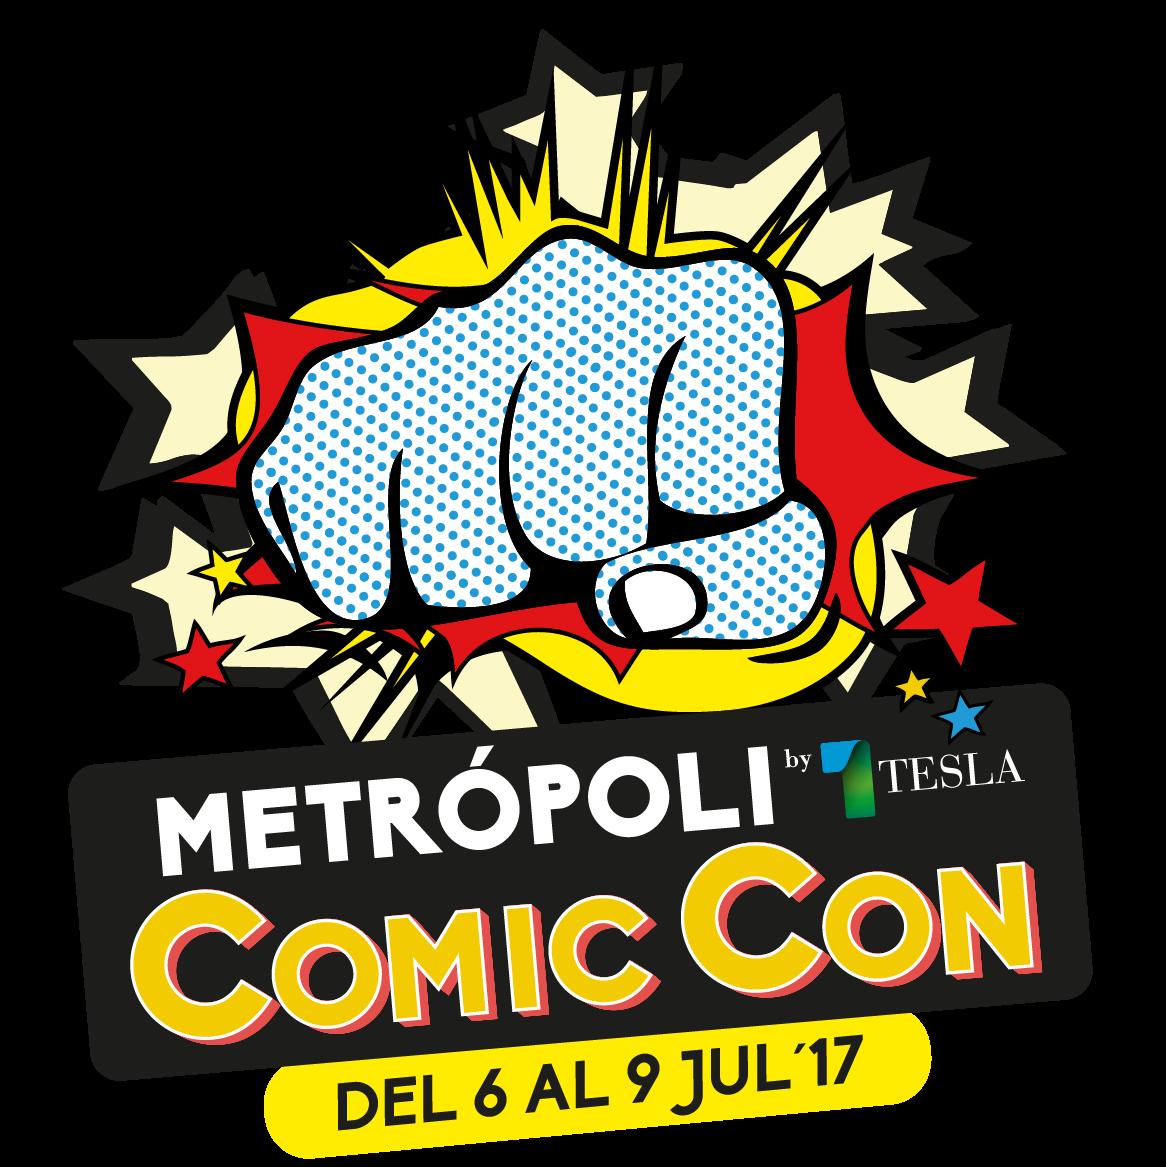 Romita Jr, Tom Lyle, Will Conrad y Jordi Bernet se unen a la Comic Con de Metrópoli by Tesla